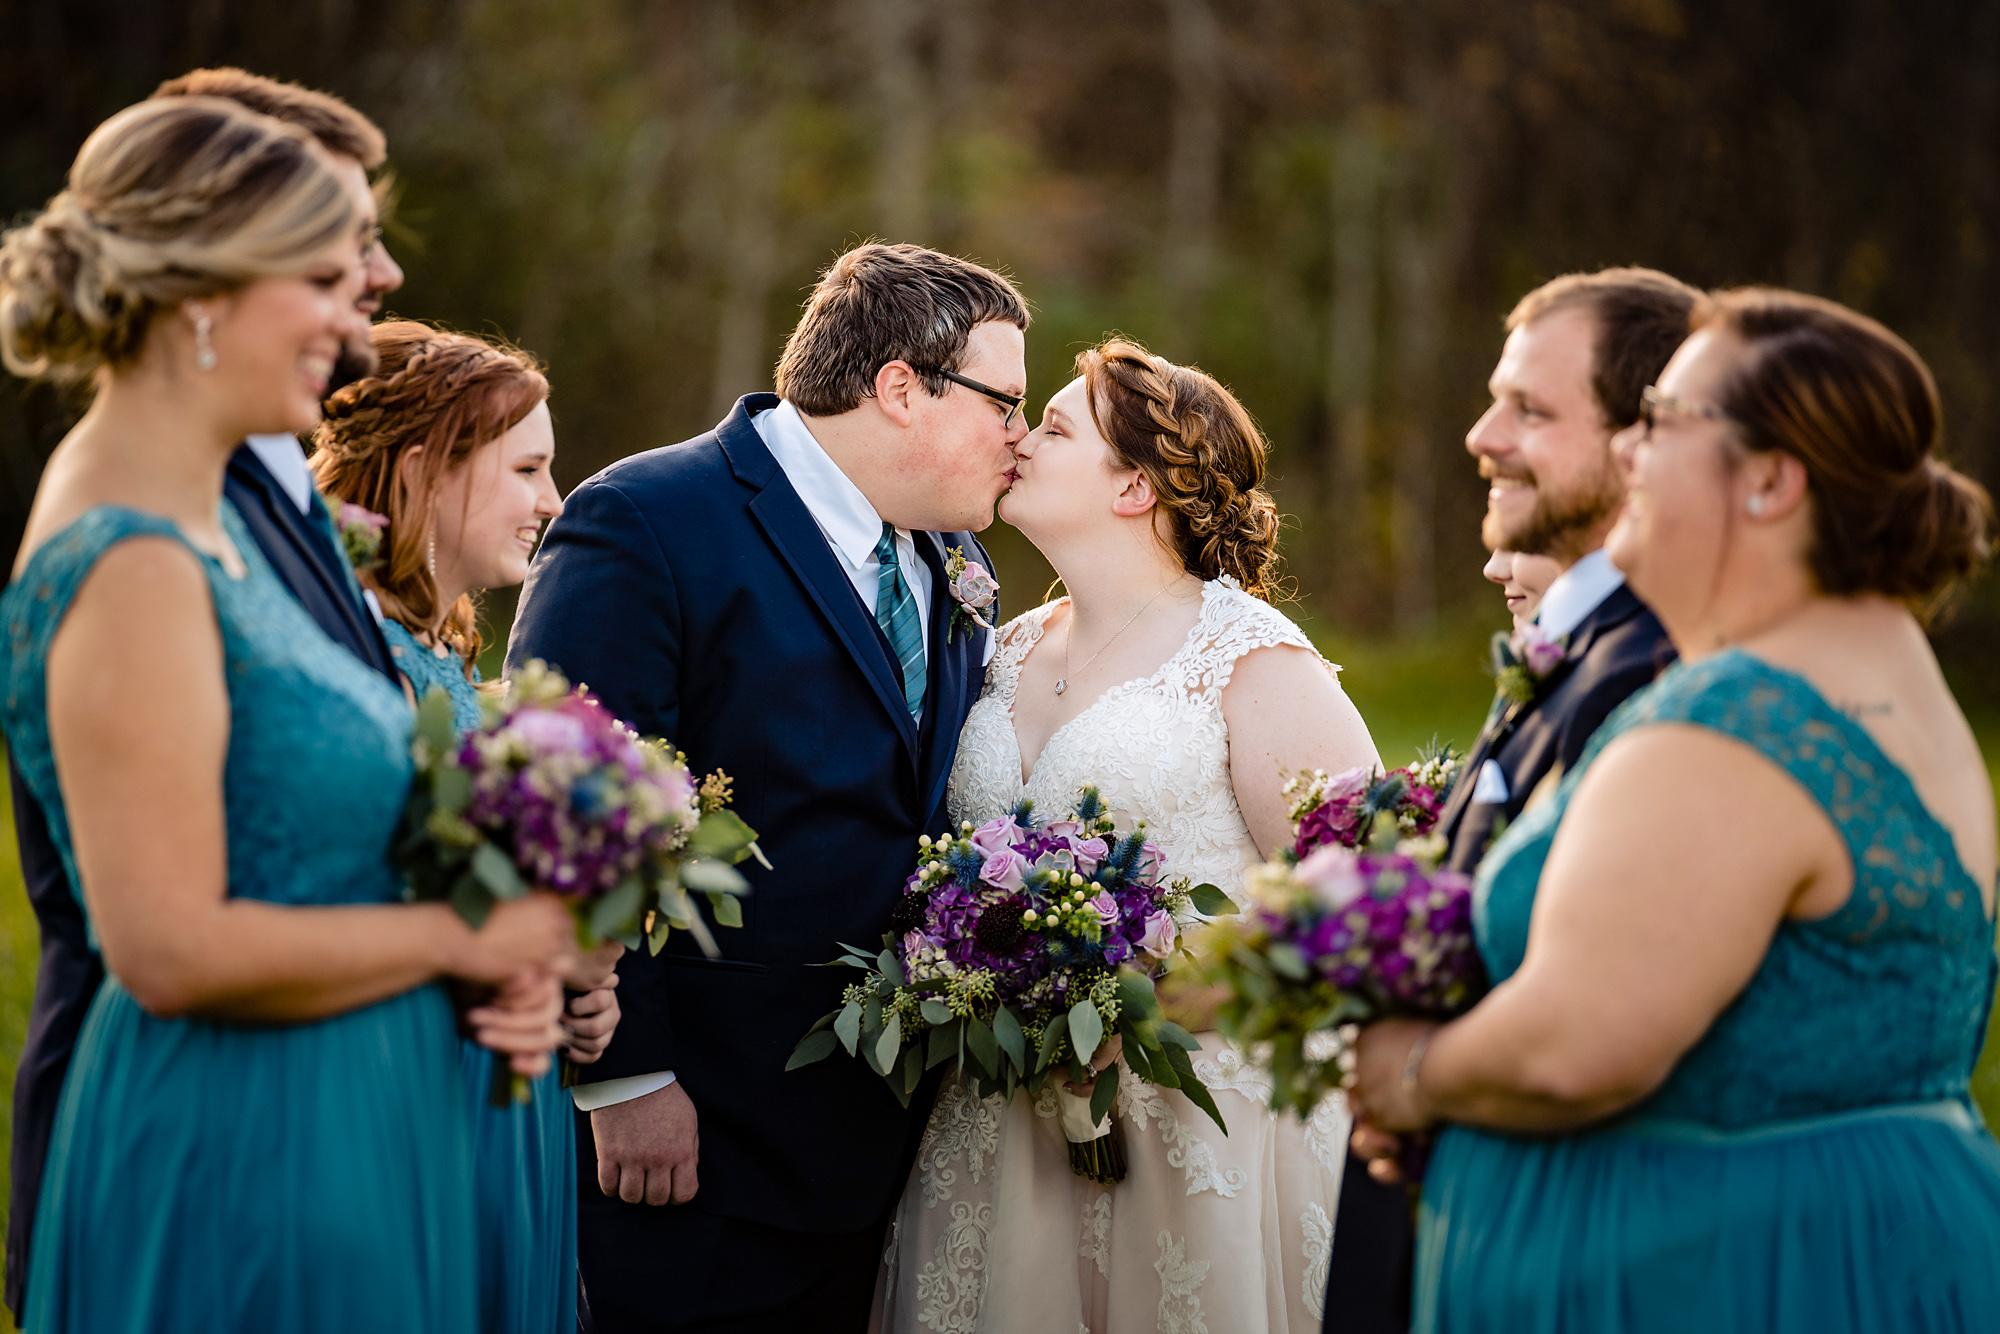 Silver-Creek-Stables-Wedding-Photography-15.jpg